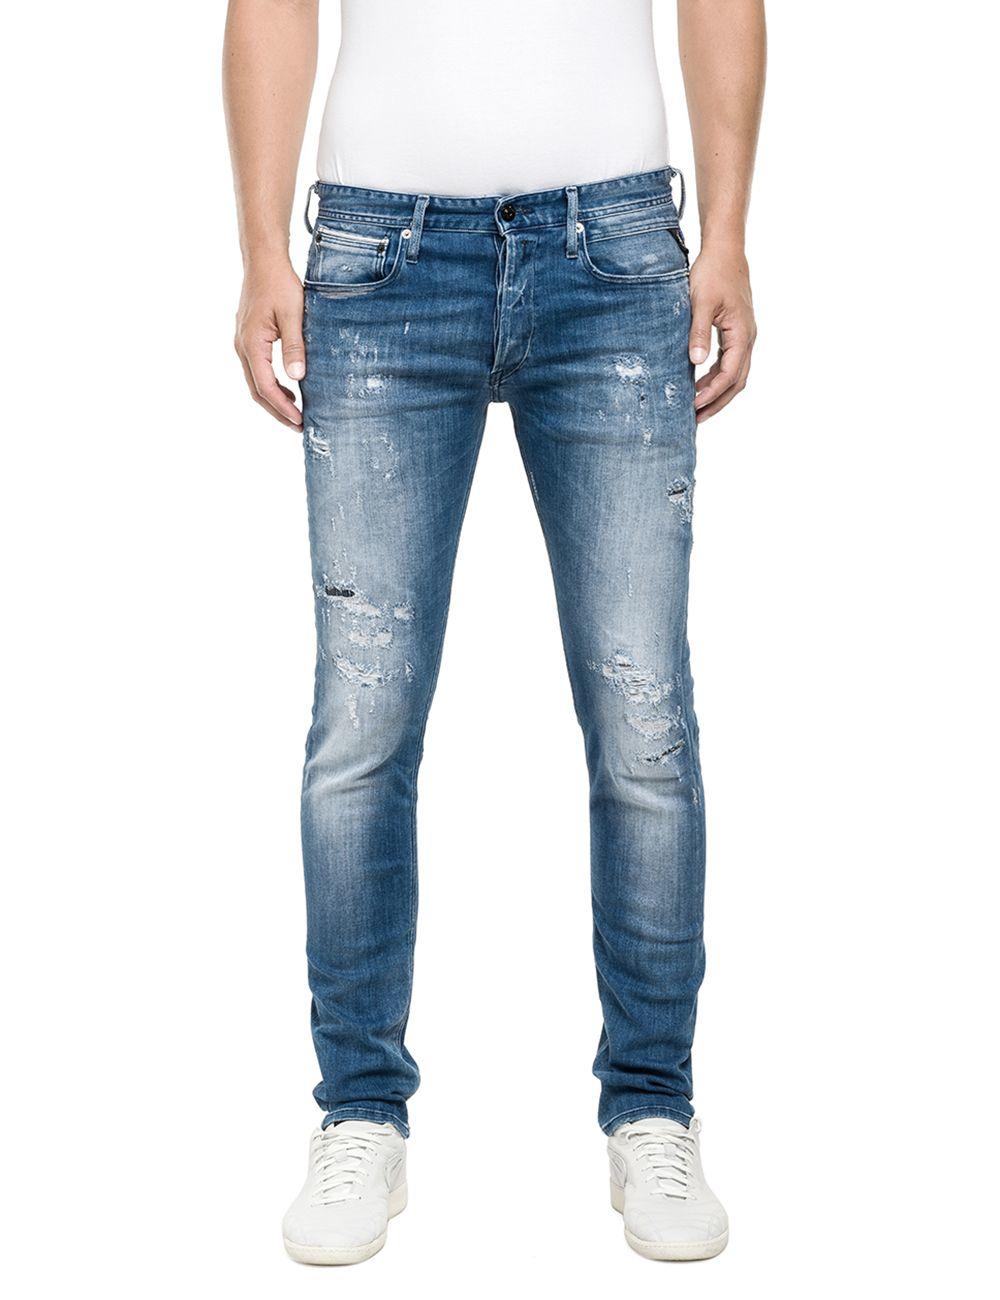 jeans herren slim fit herren g star revend super slim jeans slim fit slander black supers. Black Bedroom Furniture Sets. Home Design Ideas